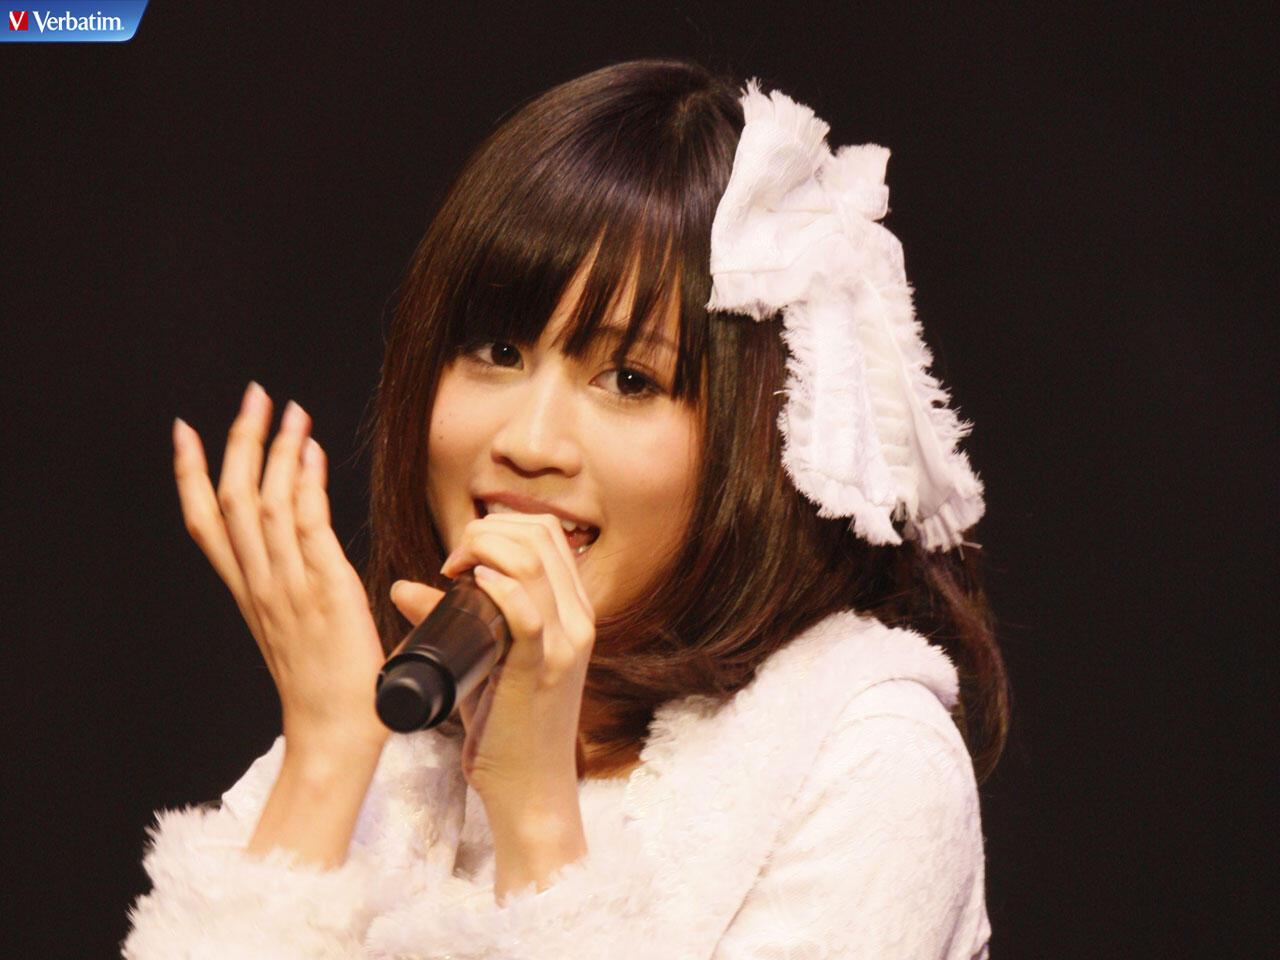 [SHARE] Virbatim Atsuko Maeda ex AKB48.